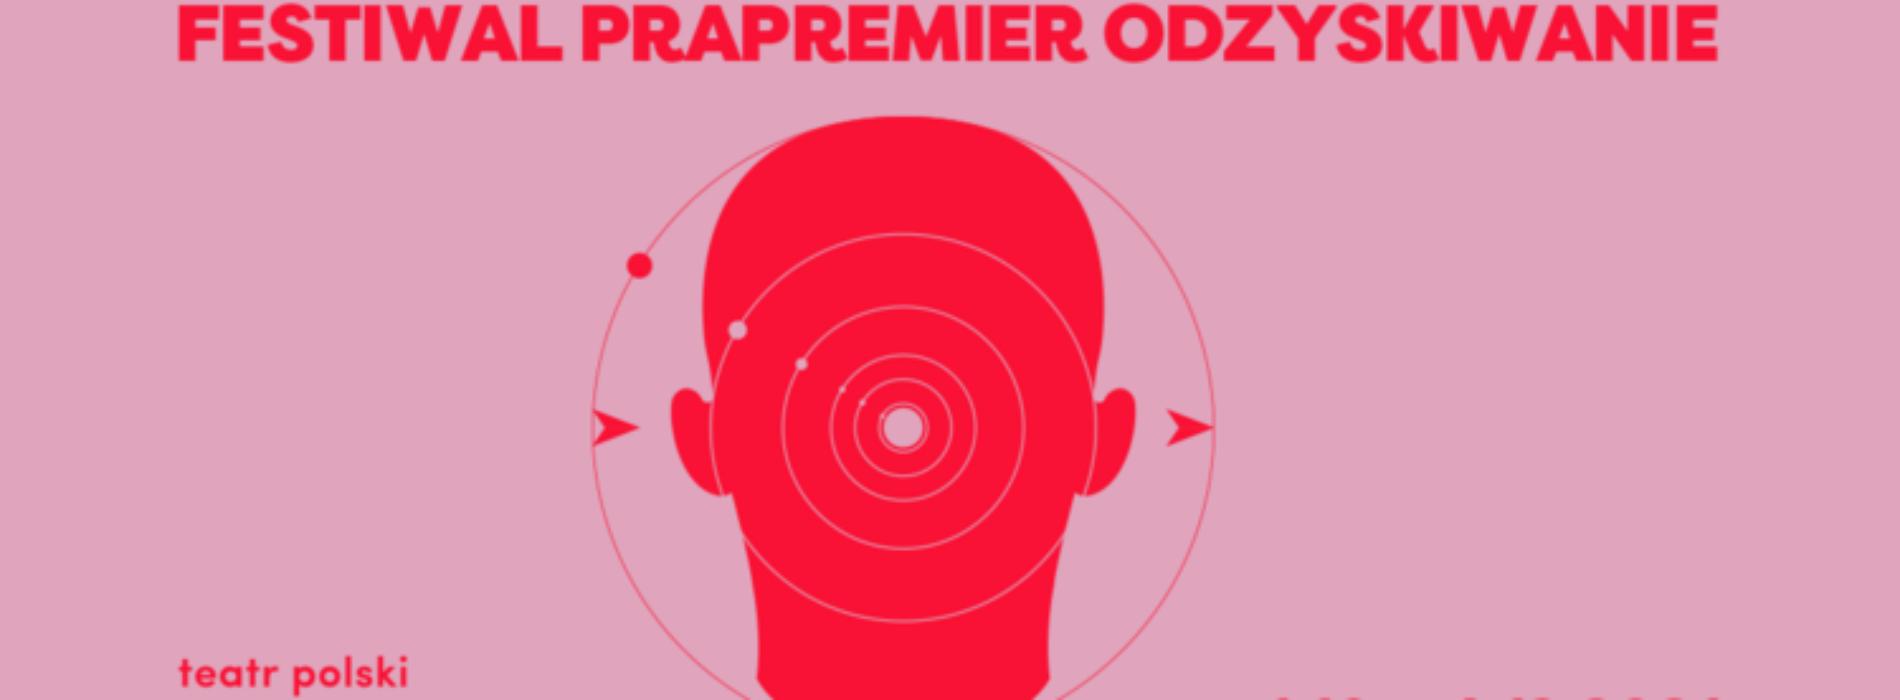 Festiwal Prapremier 2021